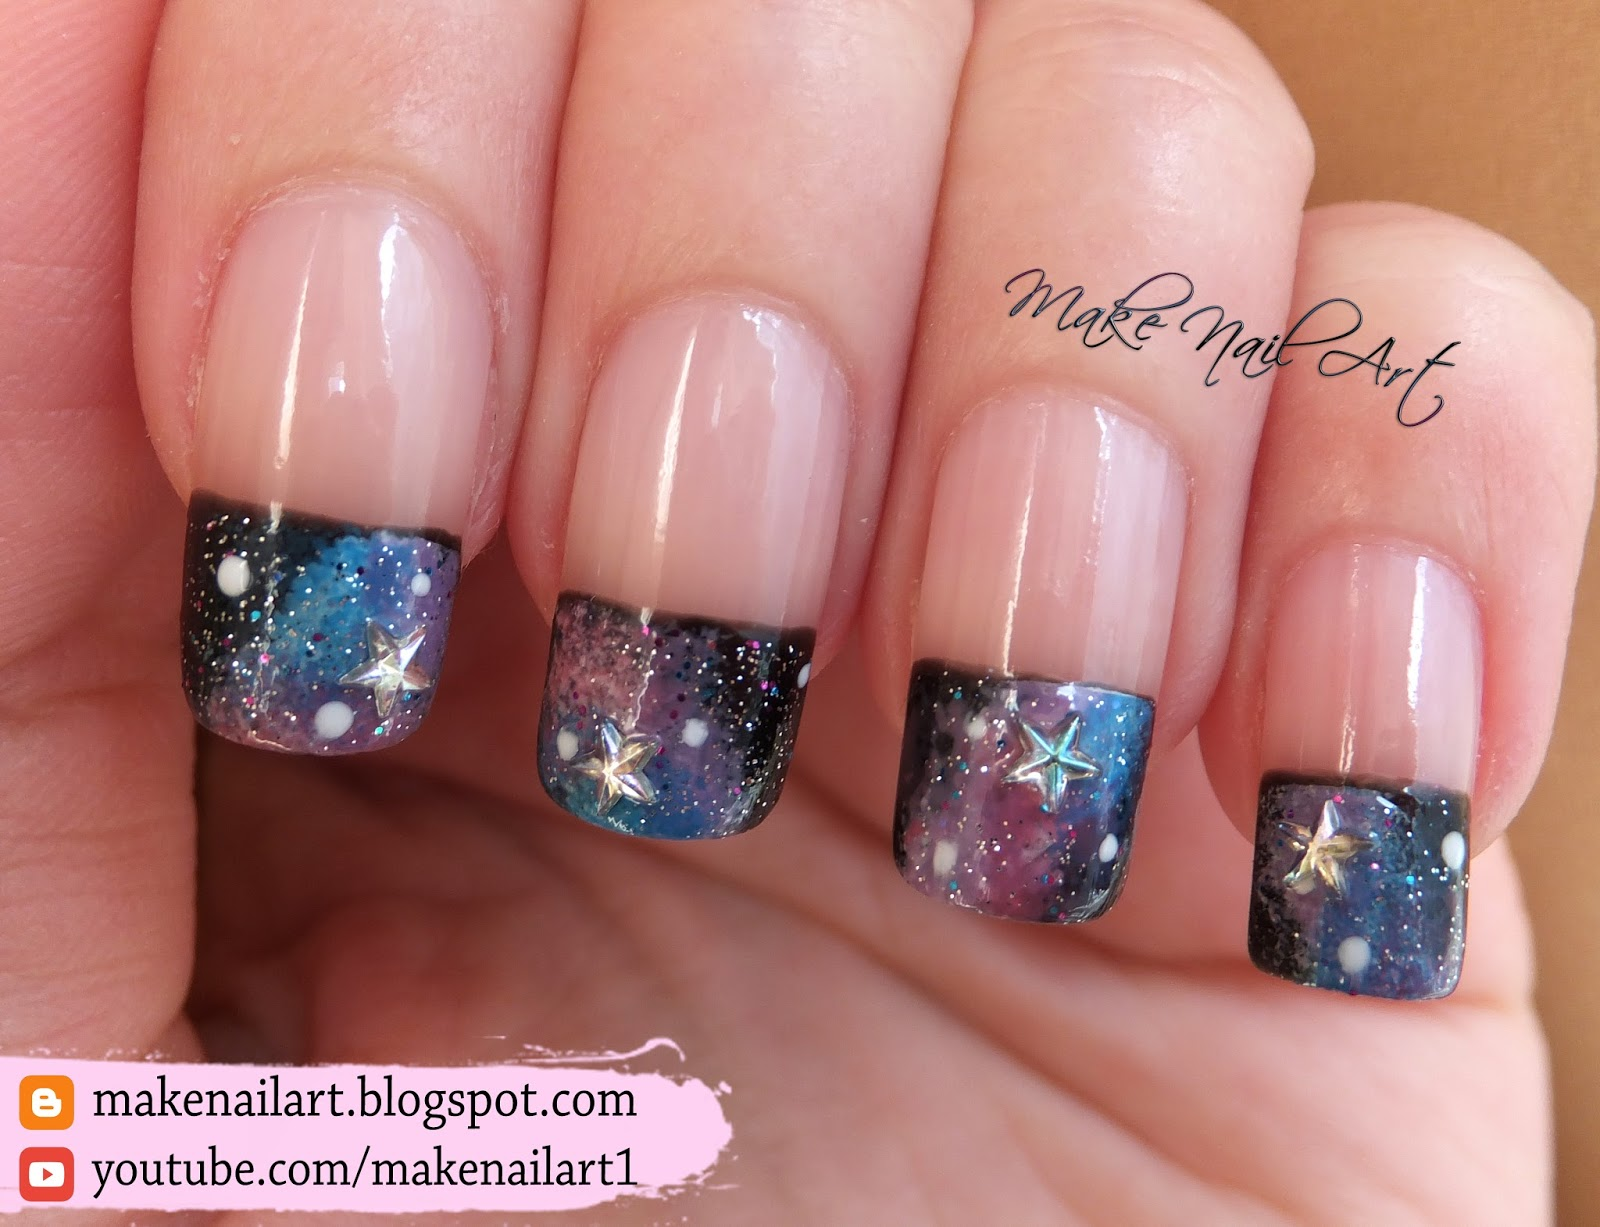 Make Nail Art: Galaxy French Manicure Nail Art Design Tutorial